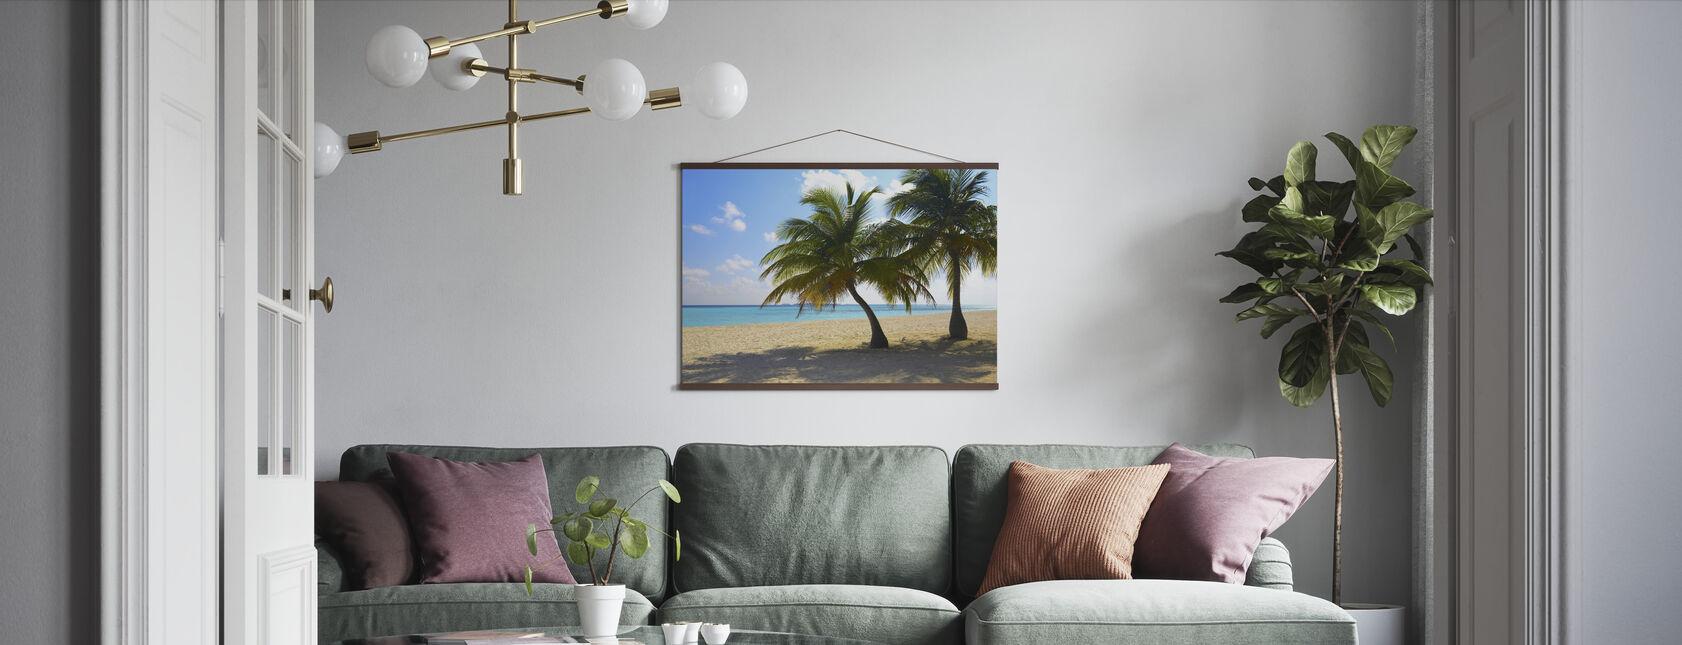 Maldives - Plakat - Stue